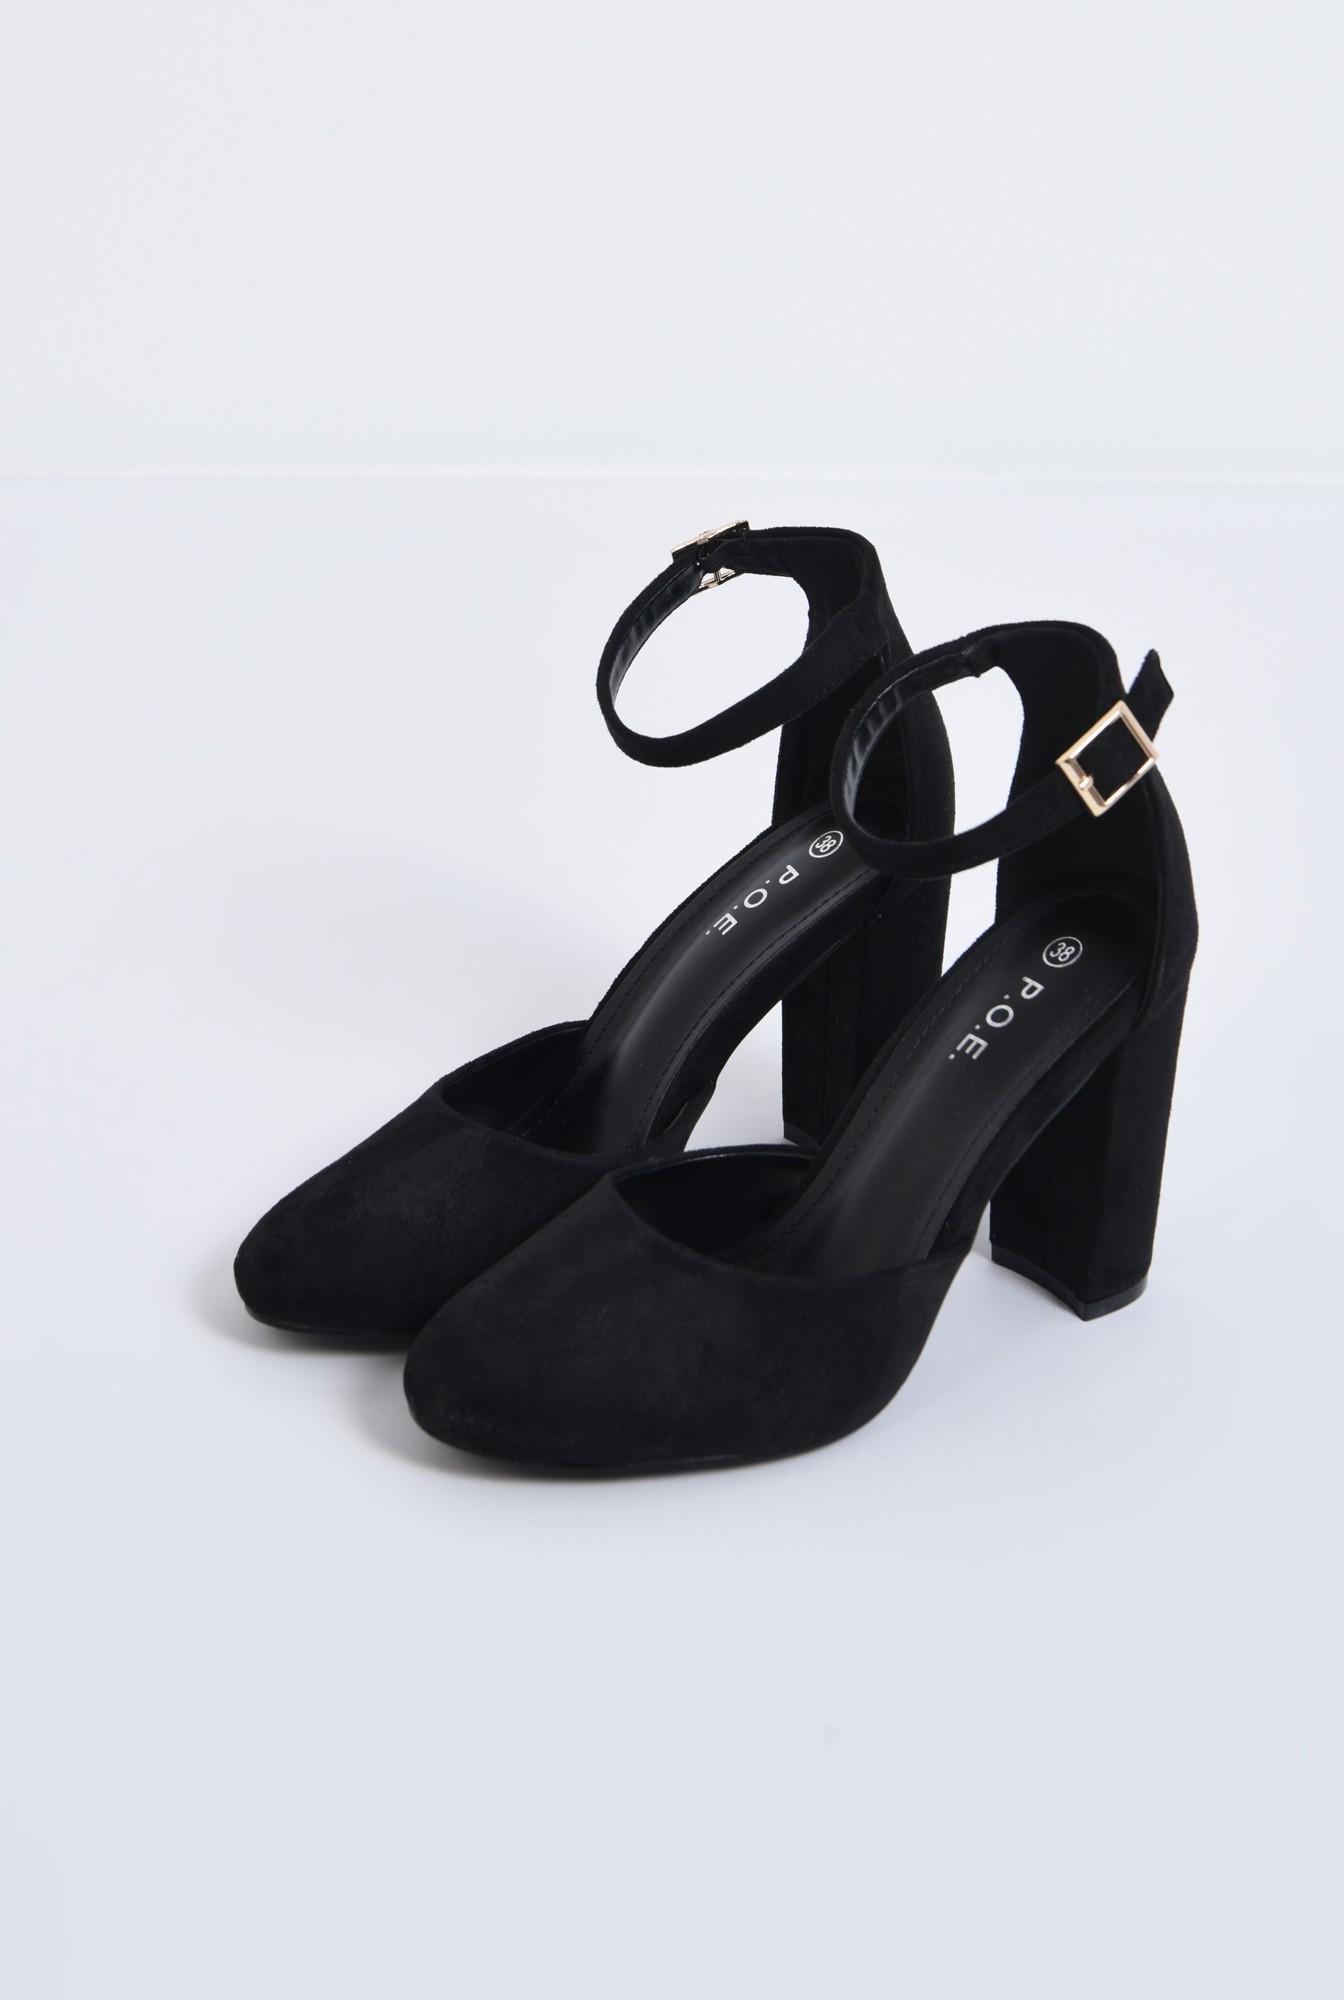 1 - pantofi casual, negri, toc gros